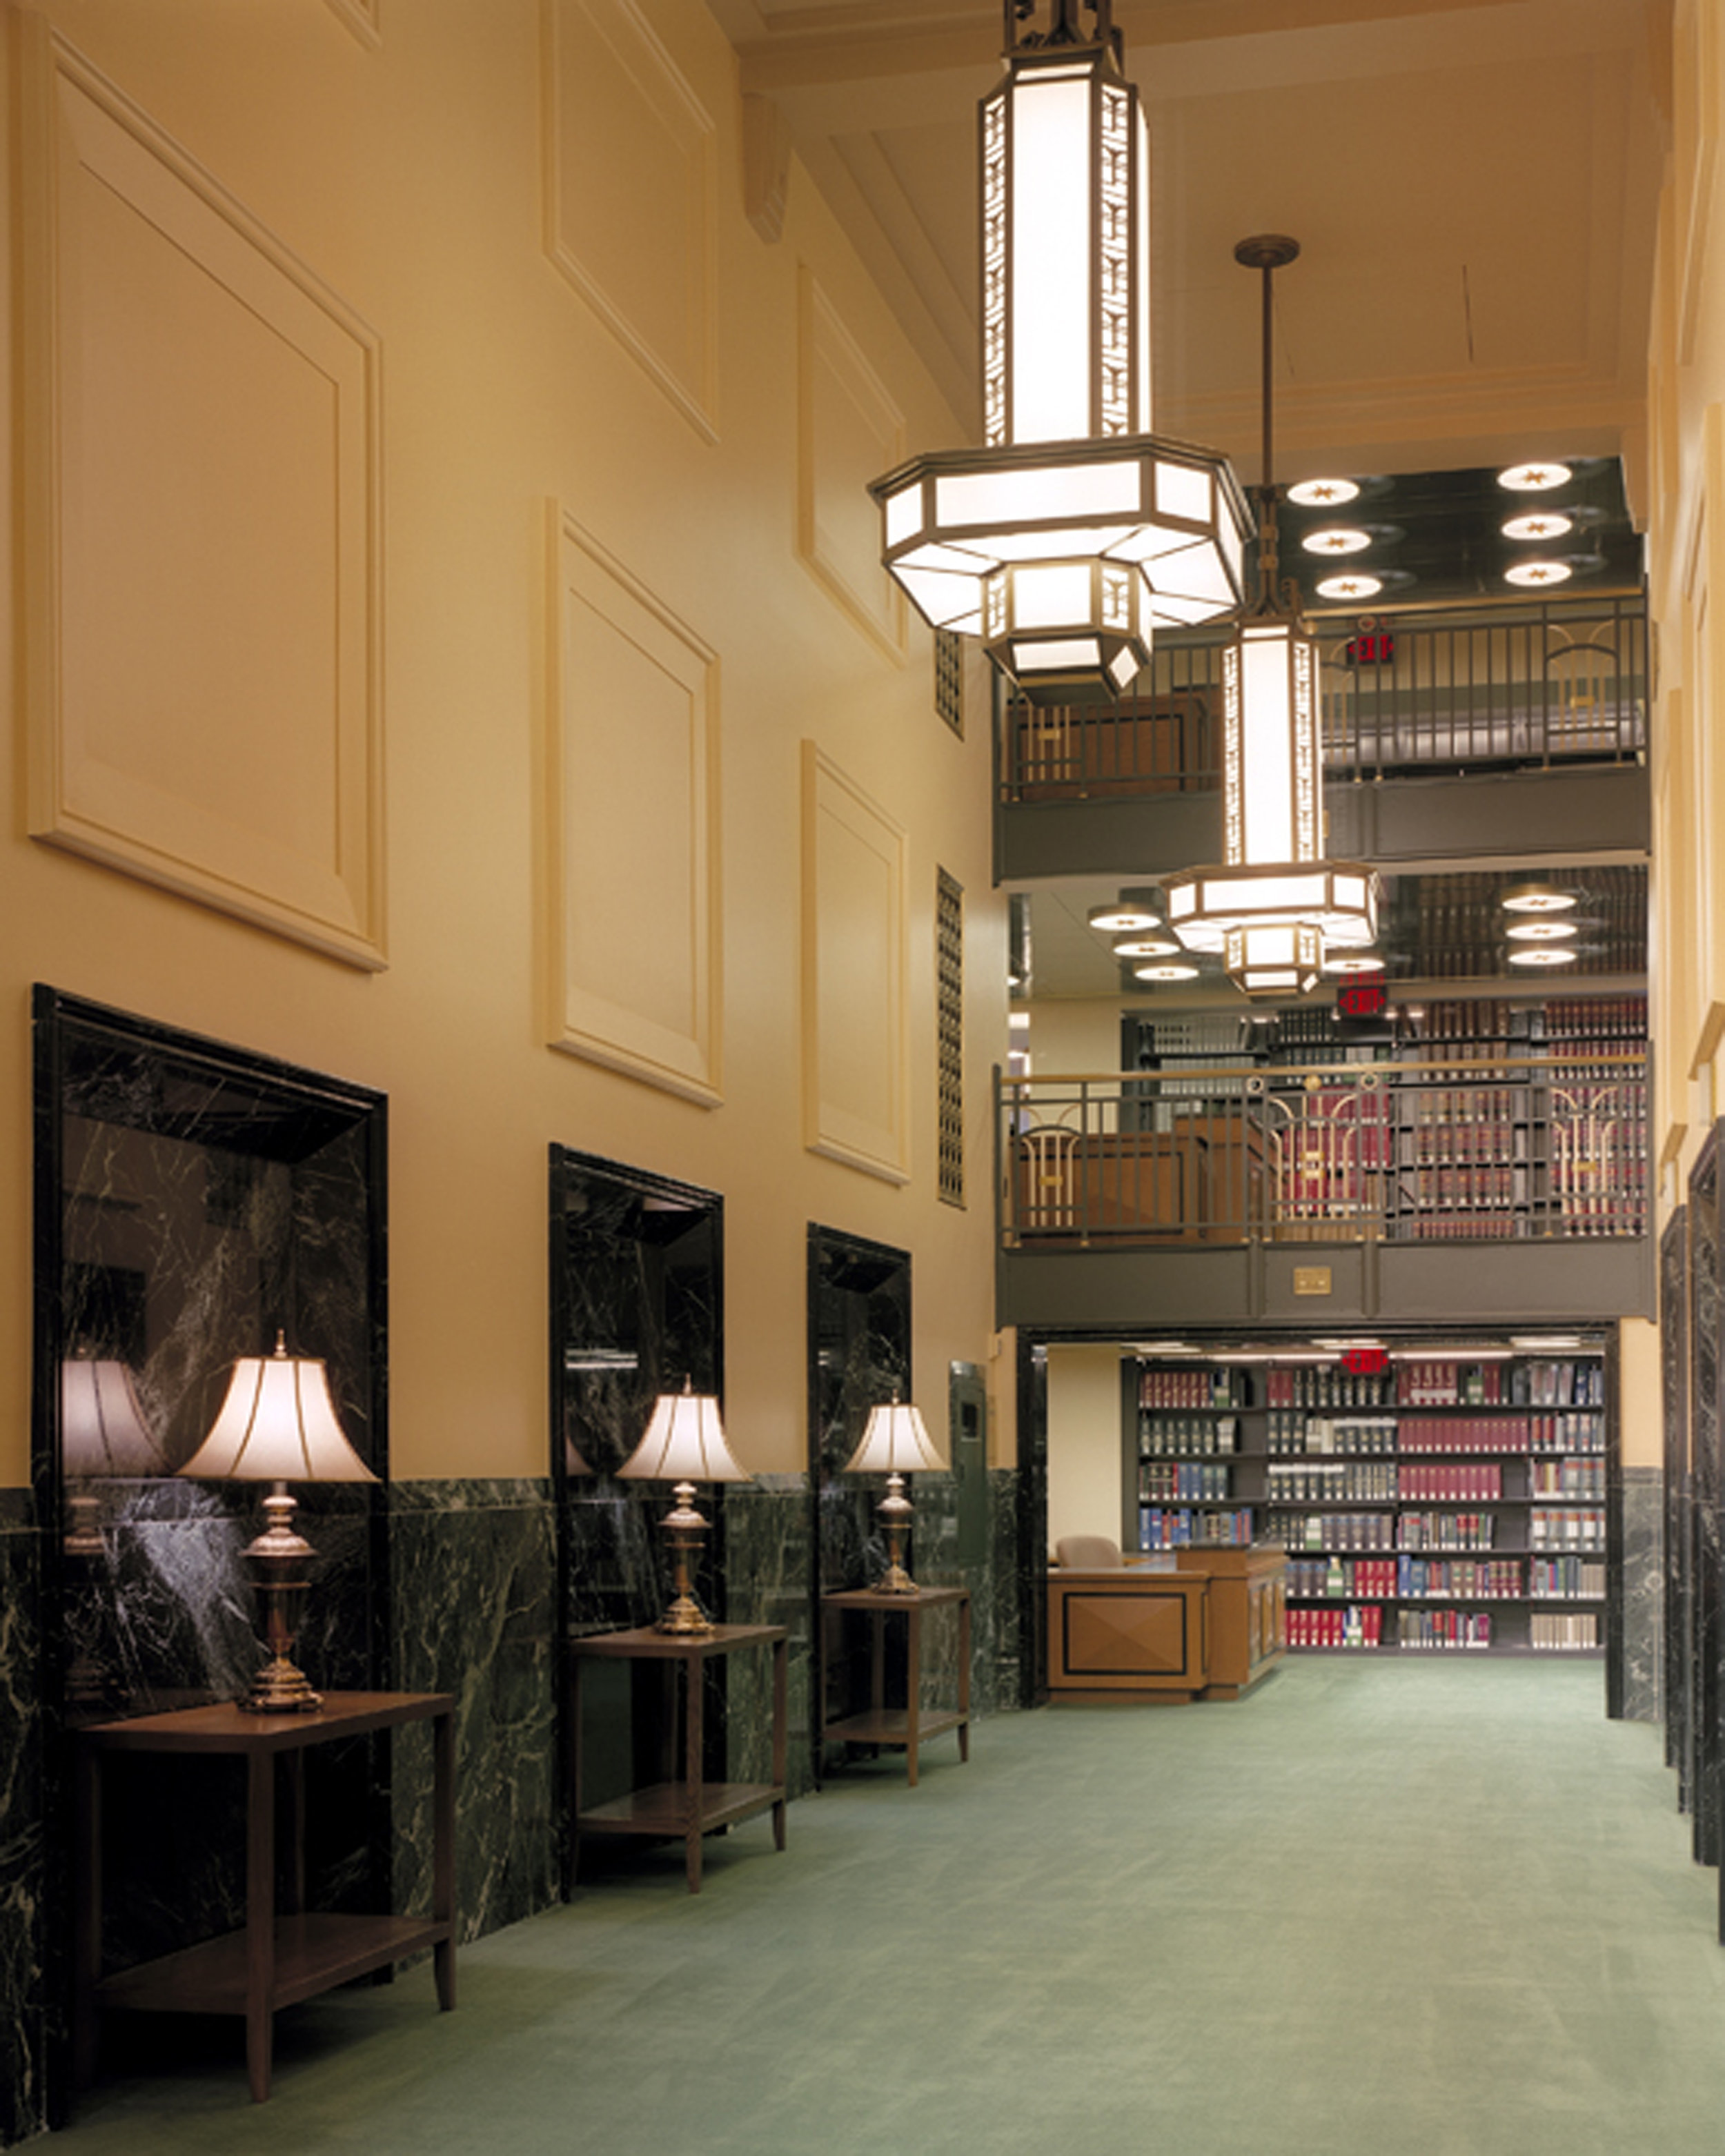 OJC_library atrium 4.jpg